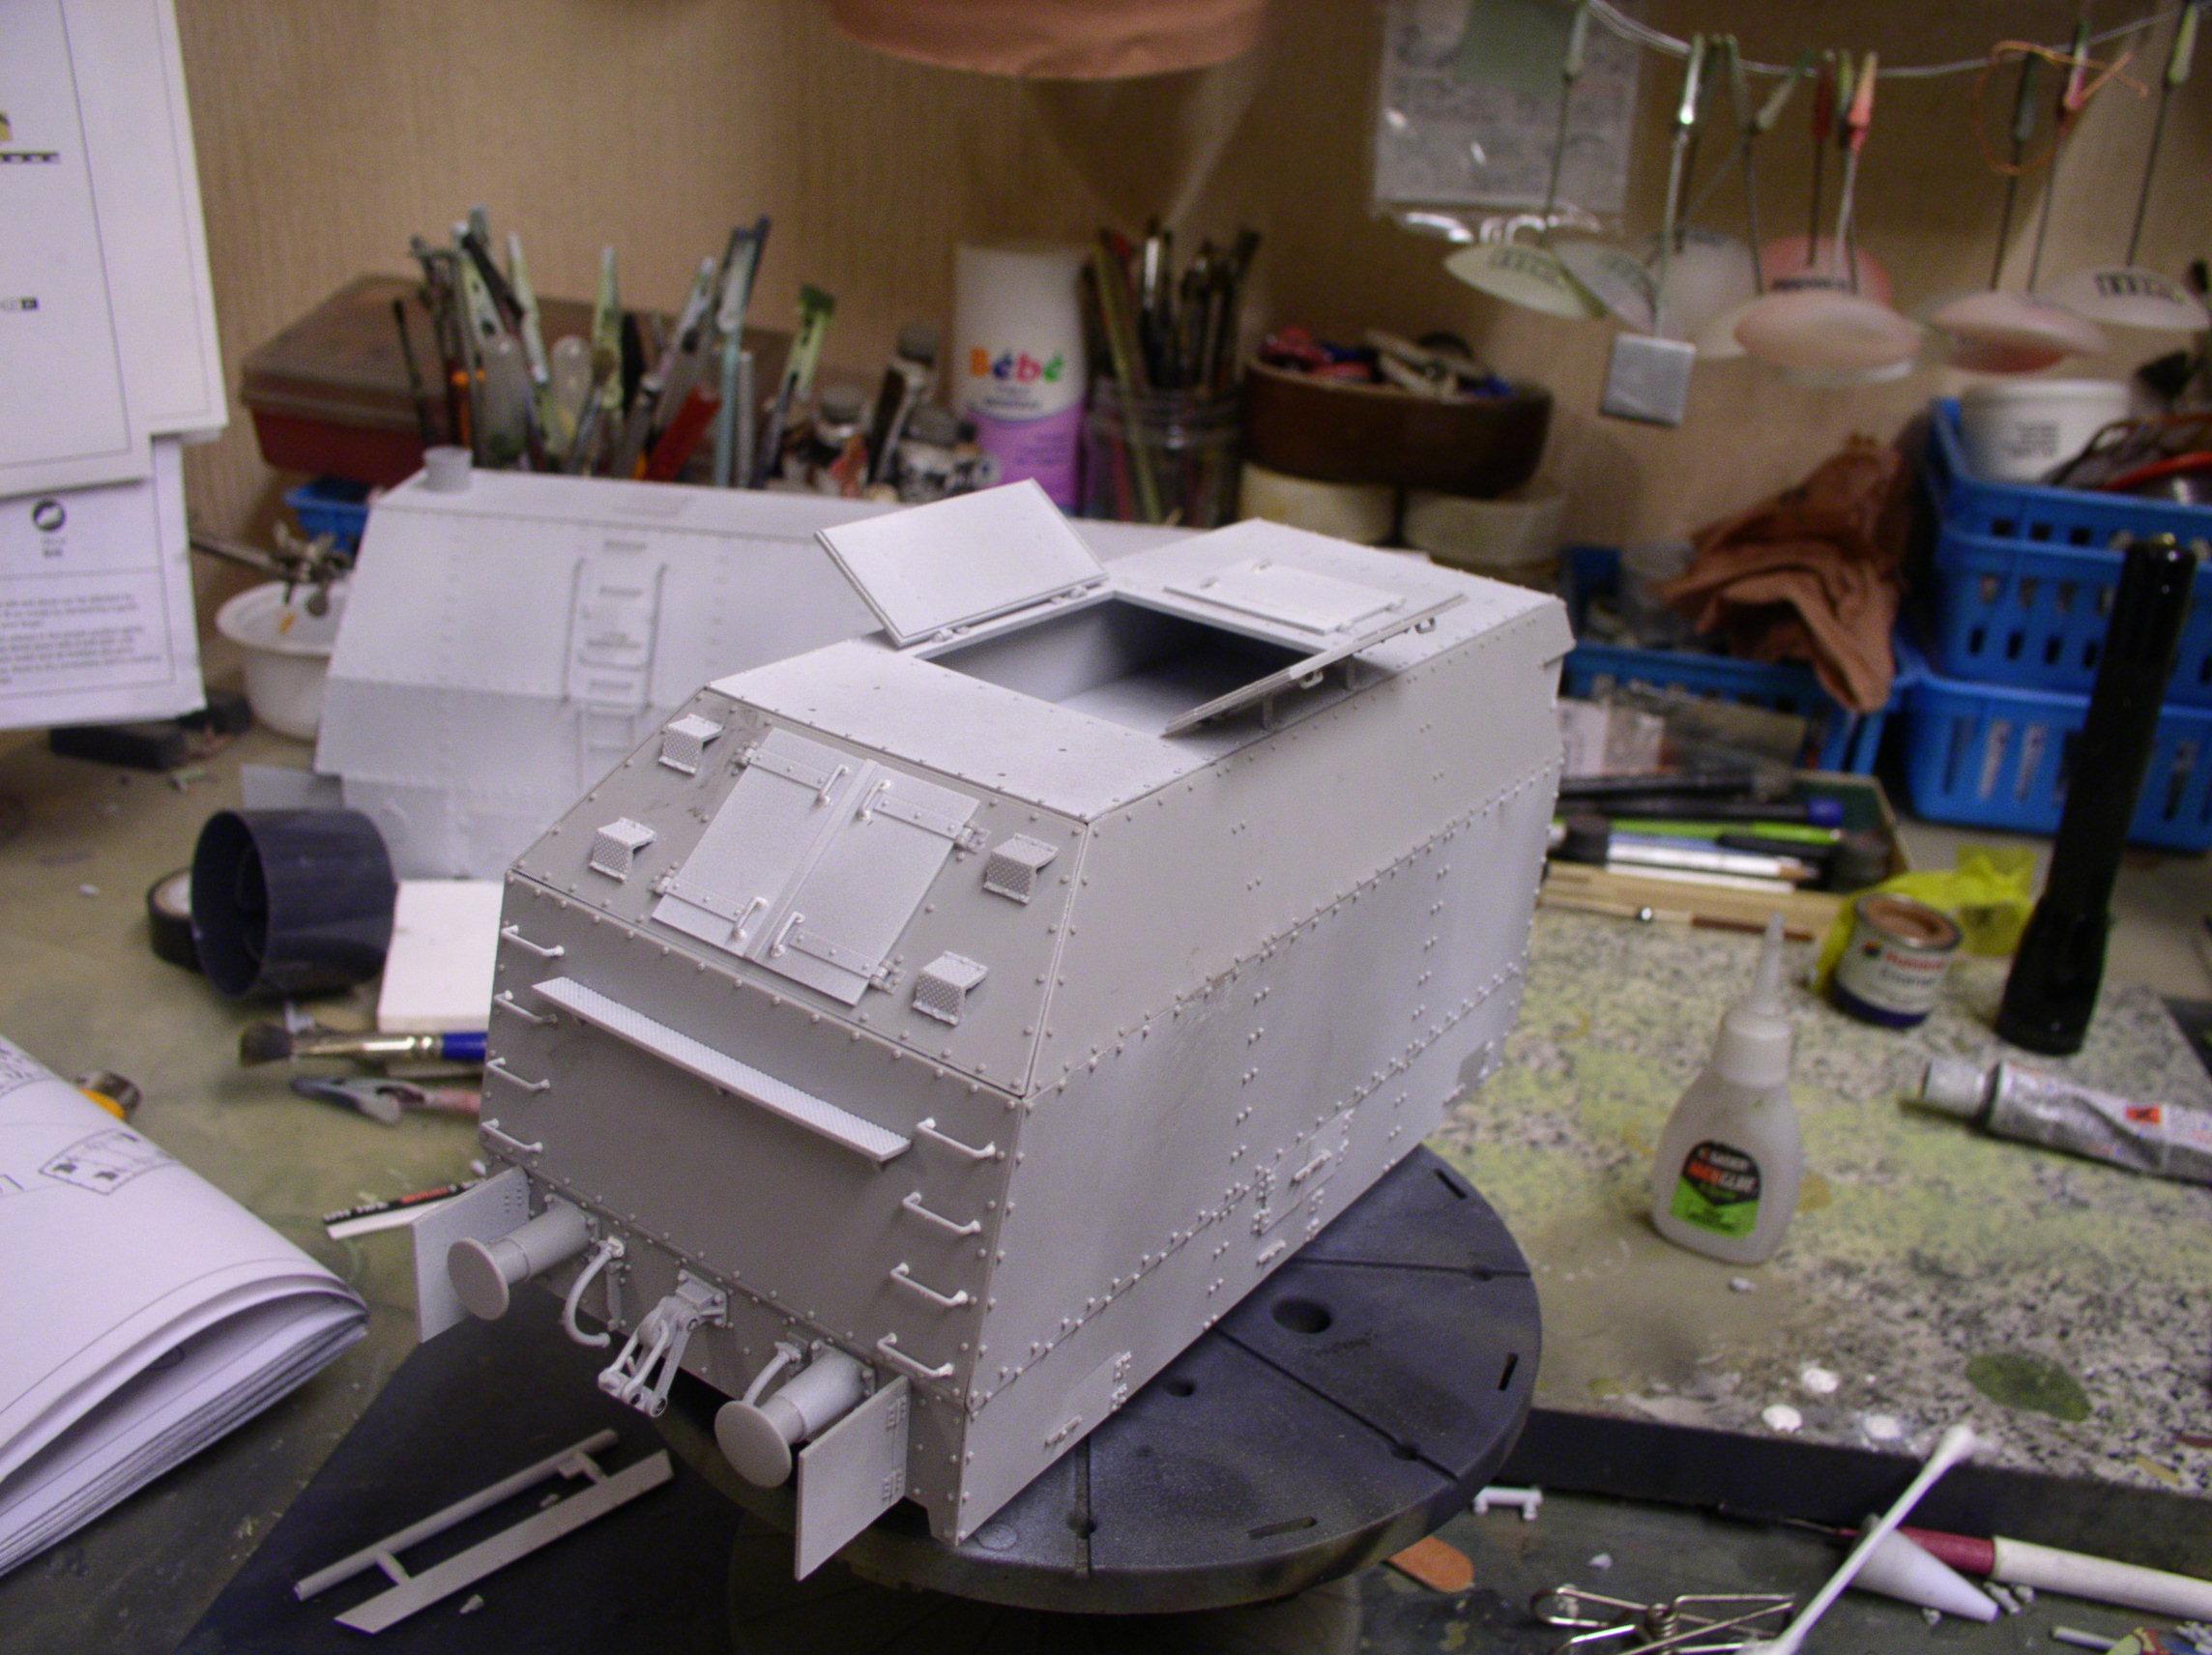 peinture - (Thunderbird) BR 57 Baureihe Panzerlok (Peinture en cours)  - Page 2 130ji